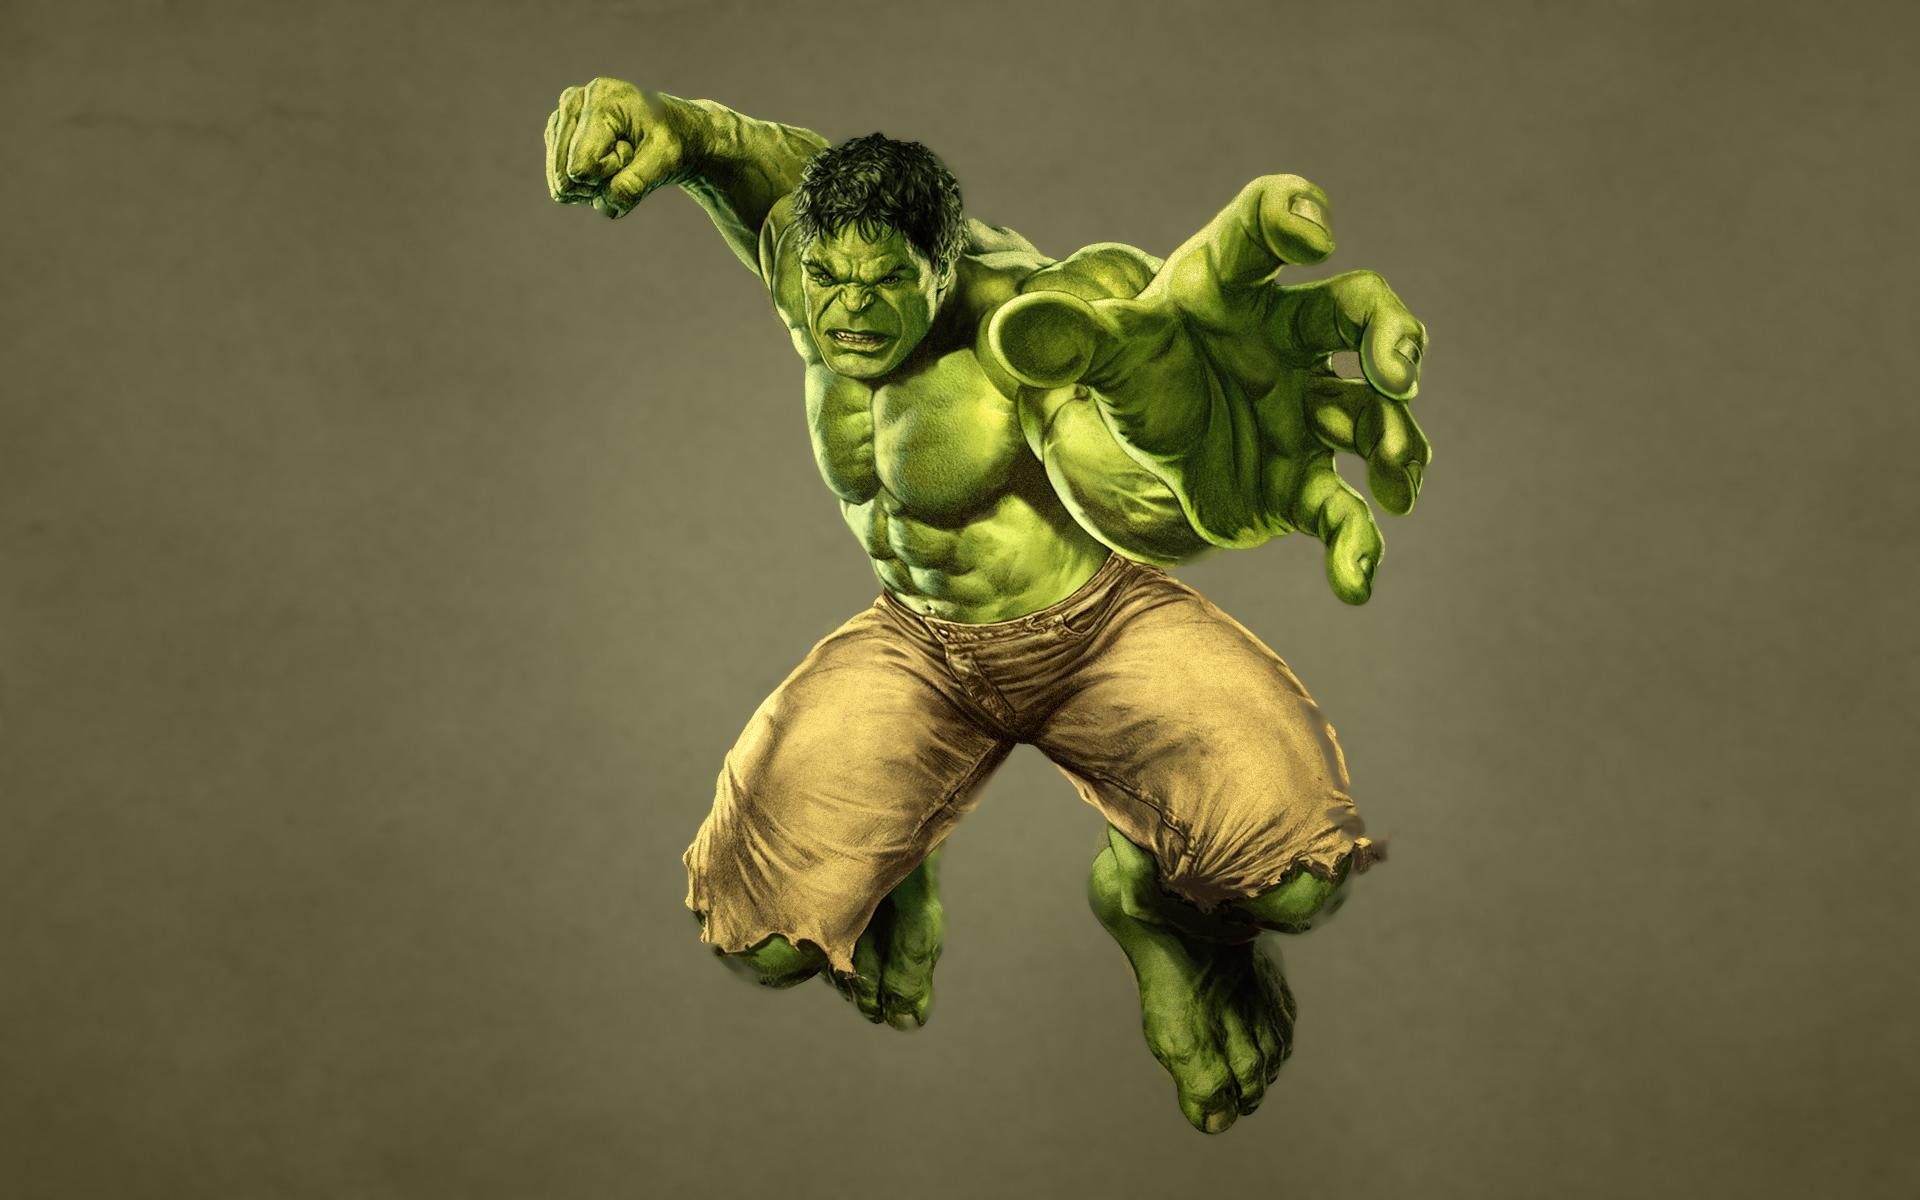 Hulk Wallpaper 22770